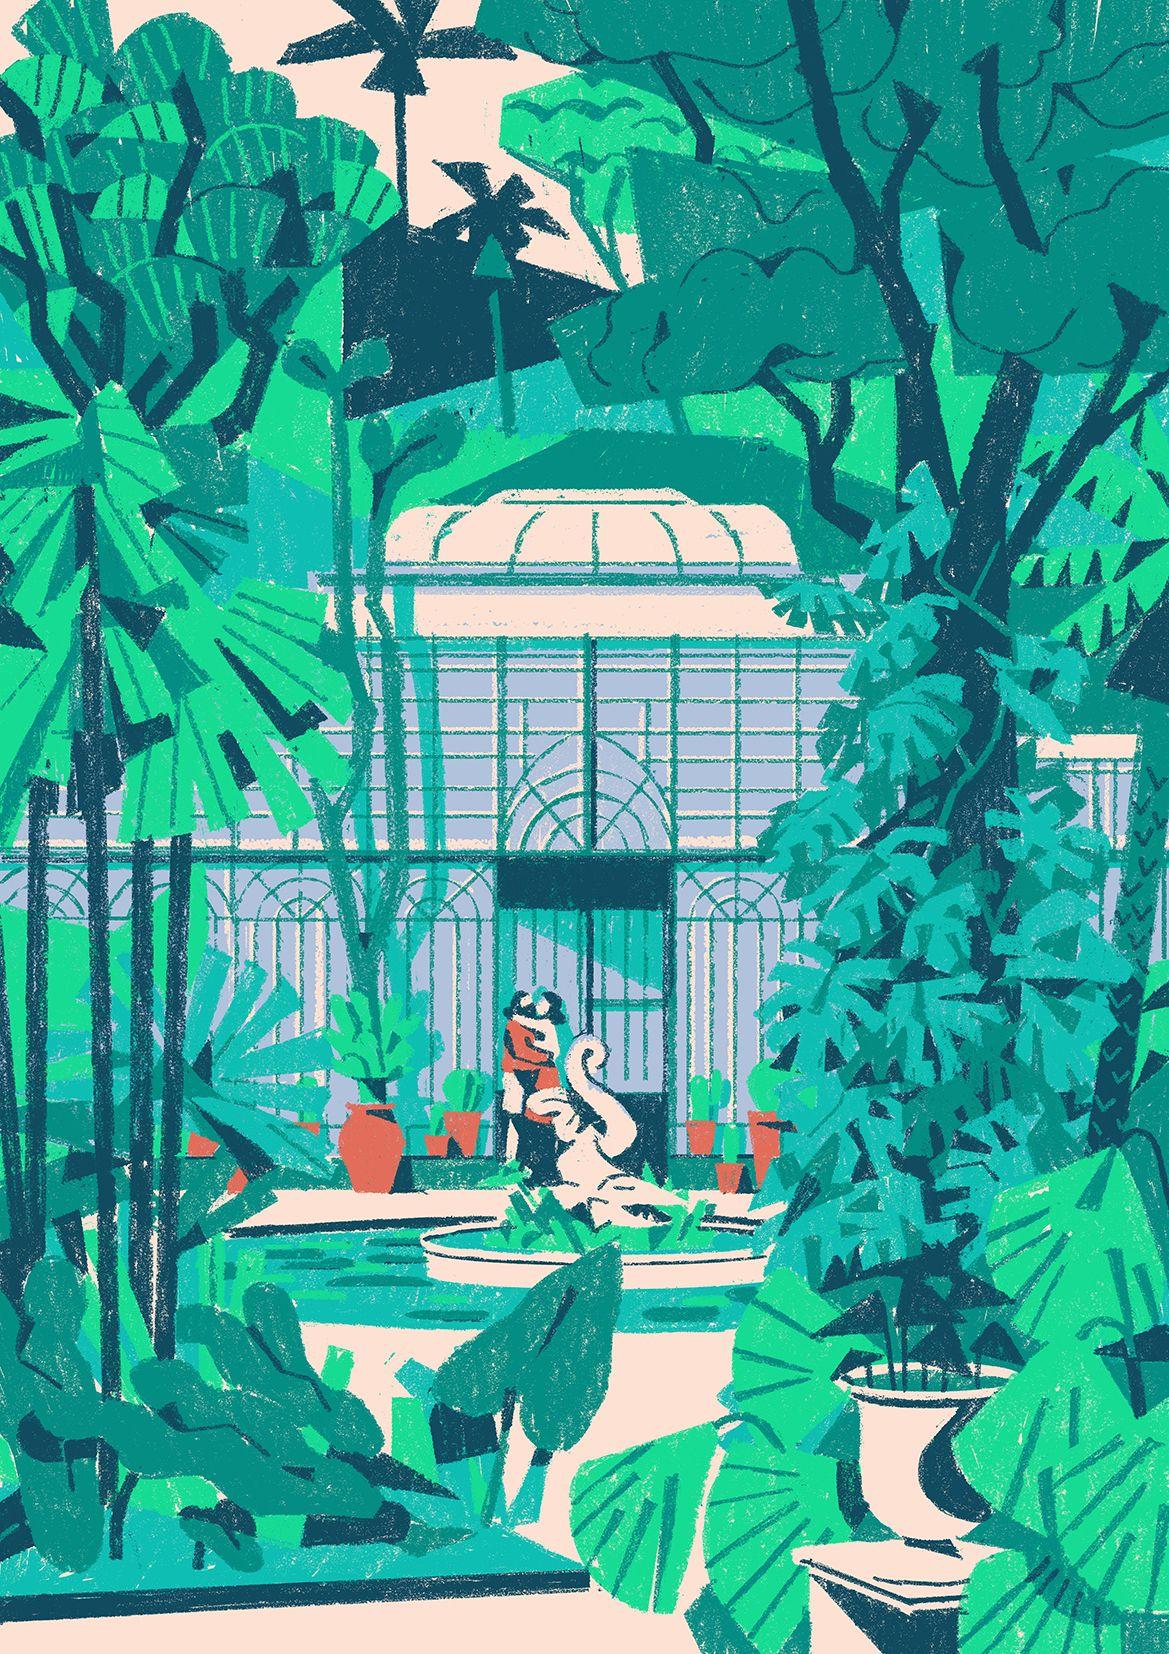 Matteo Berton The Botanic Garden Of Palermo From A Series Of